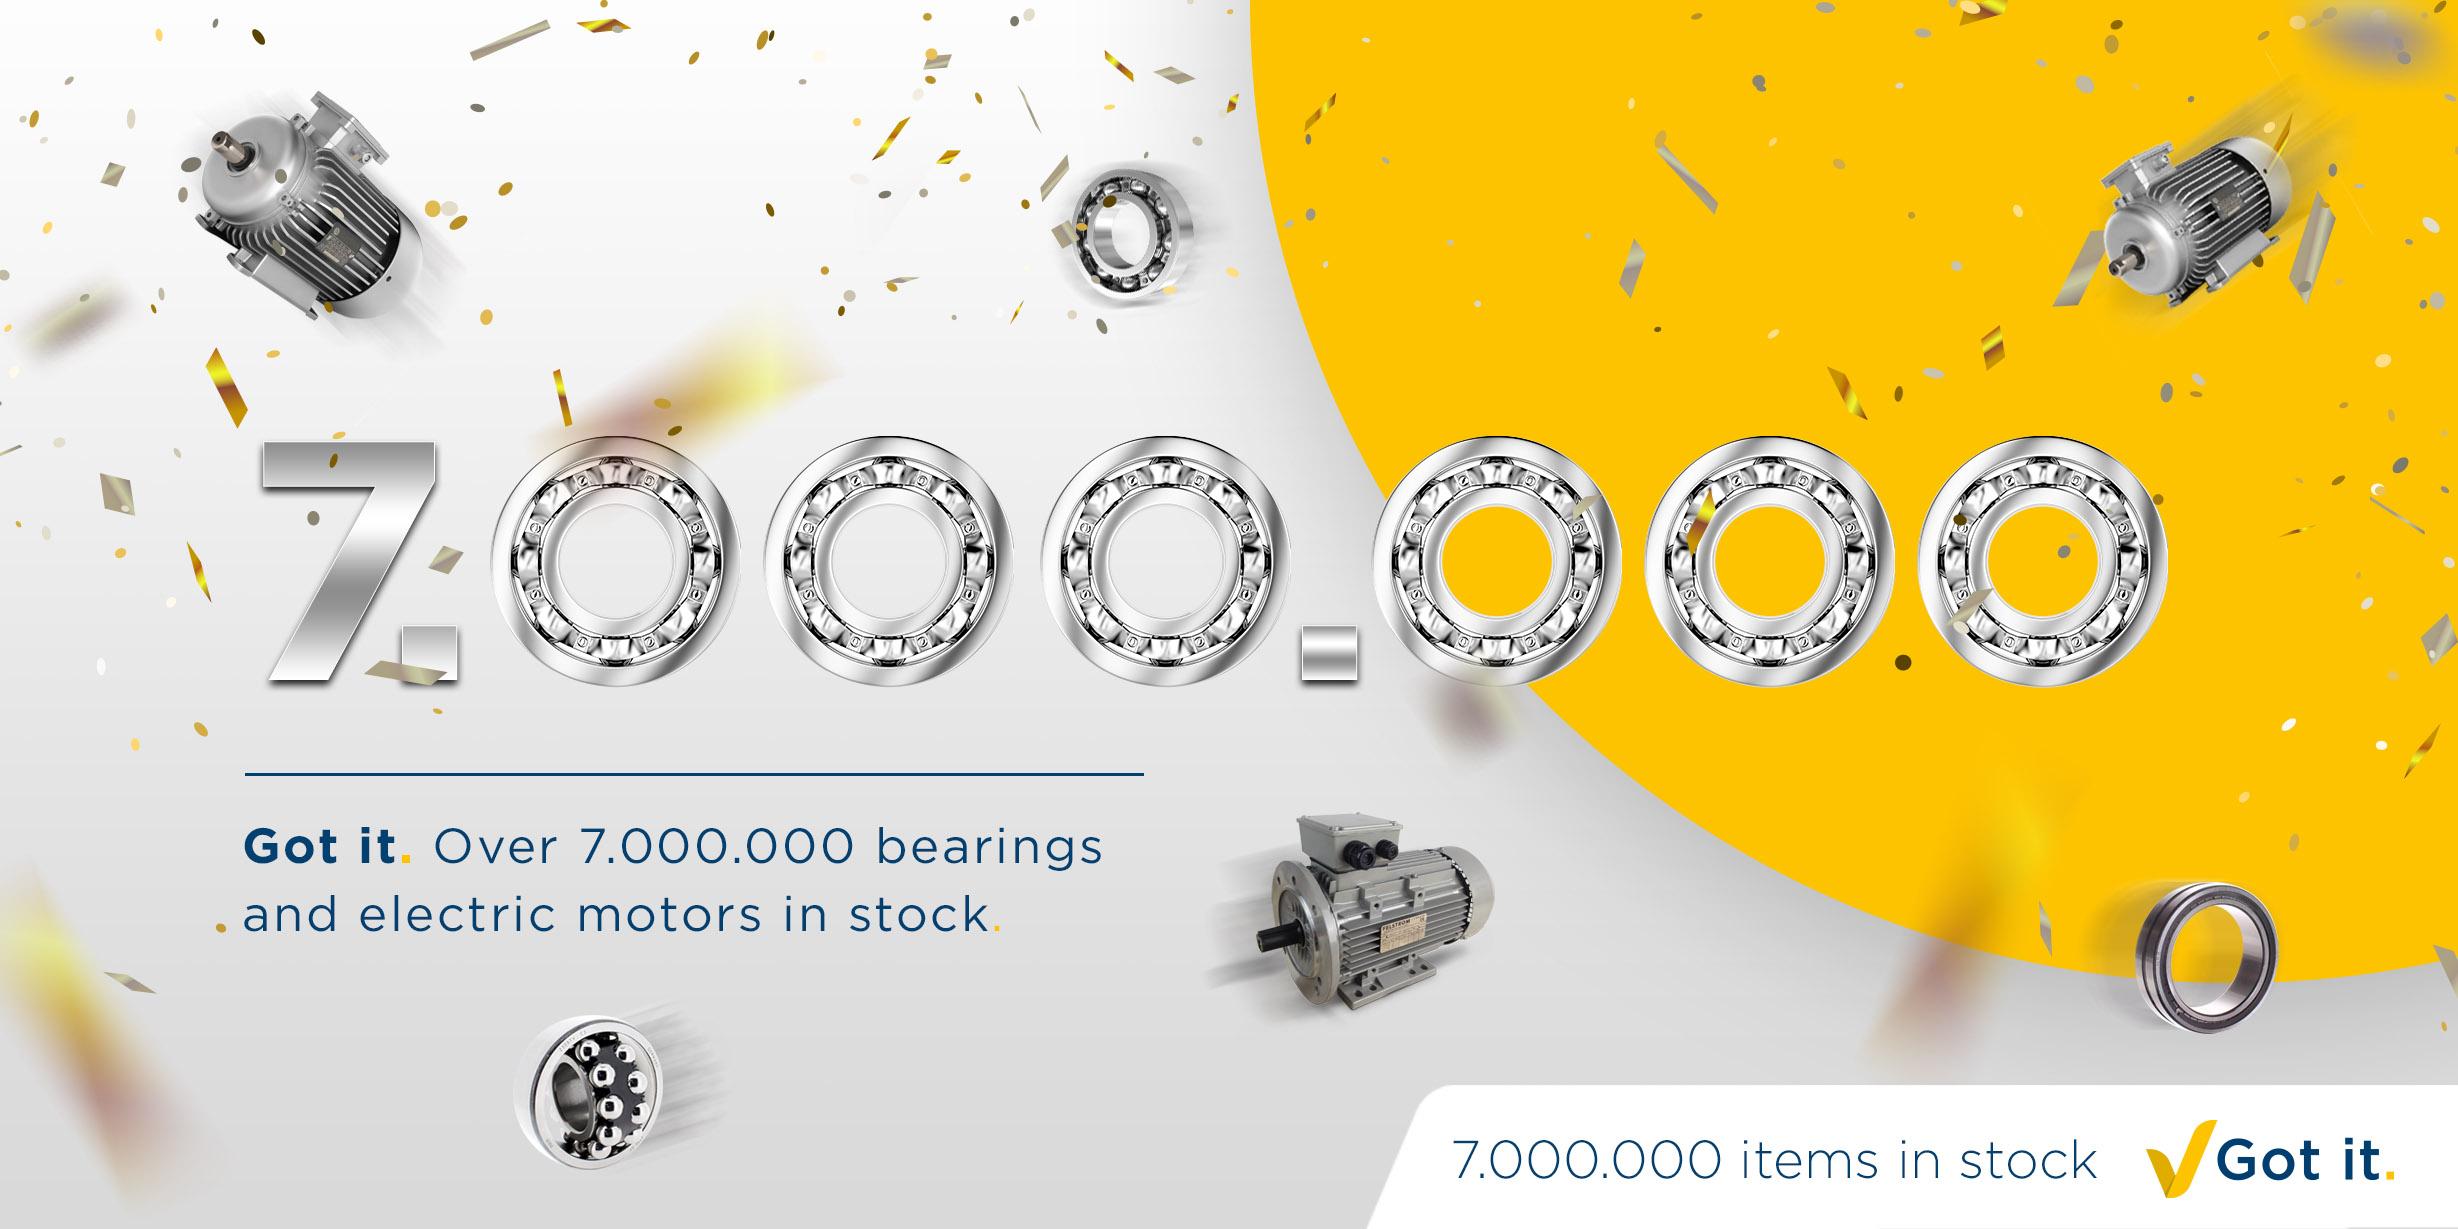 image 700000 bearings and electric motors